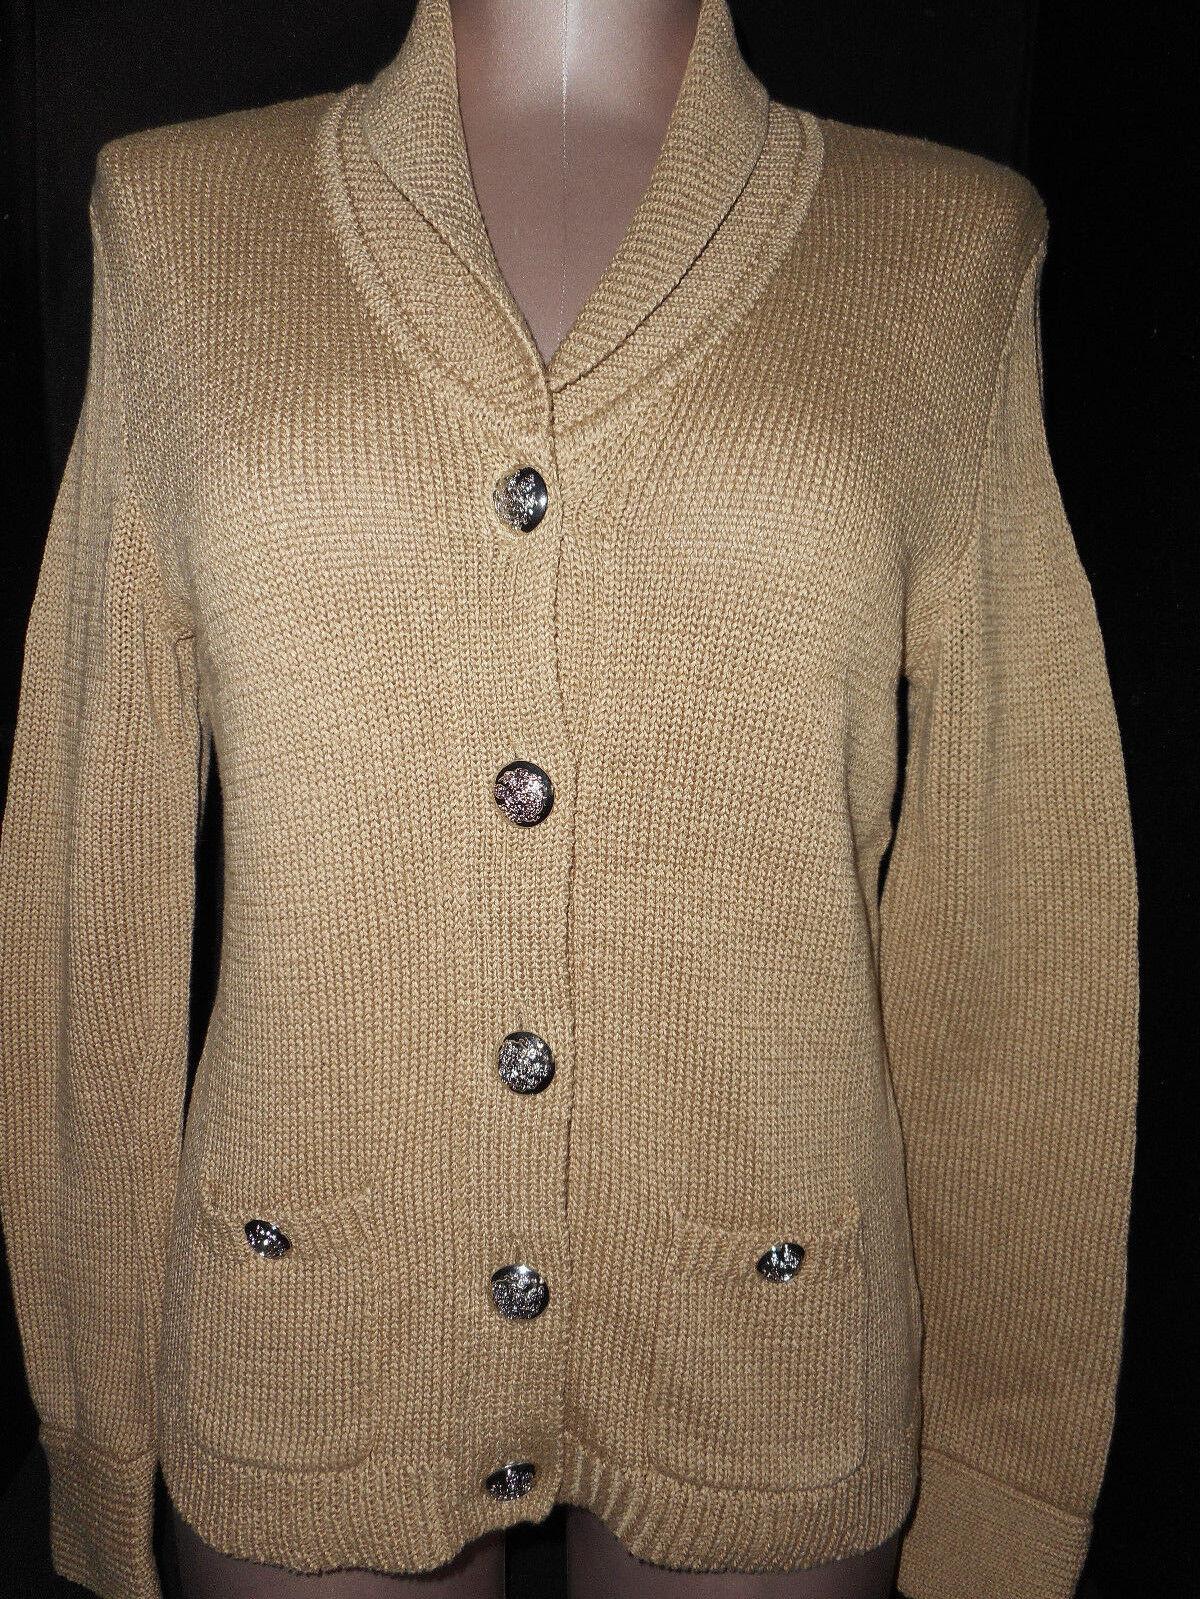 Ralph Lauren Polo Womens Cardigan Button Front Sweater Sz P-Medium Beige Cotton